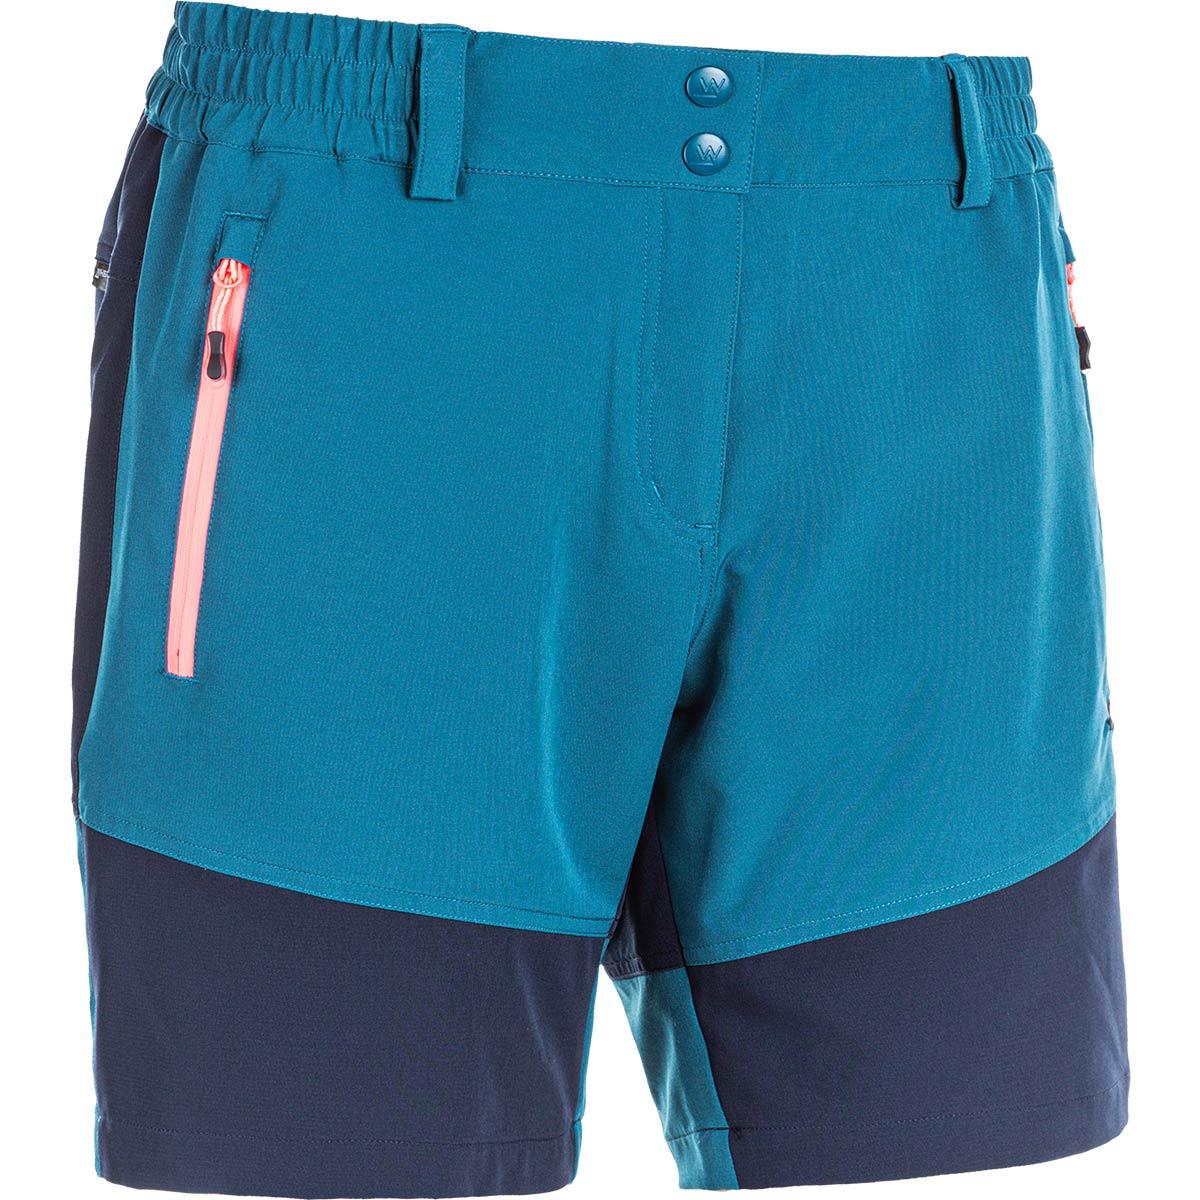 Whistler Lala Stretch Shorts, Dame